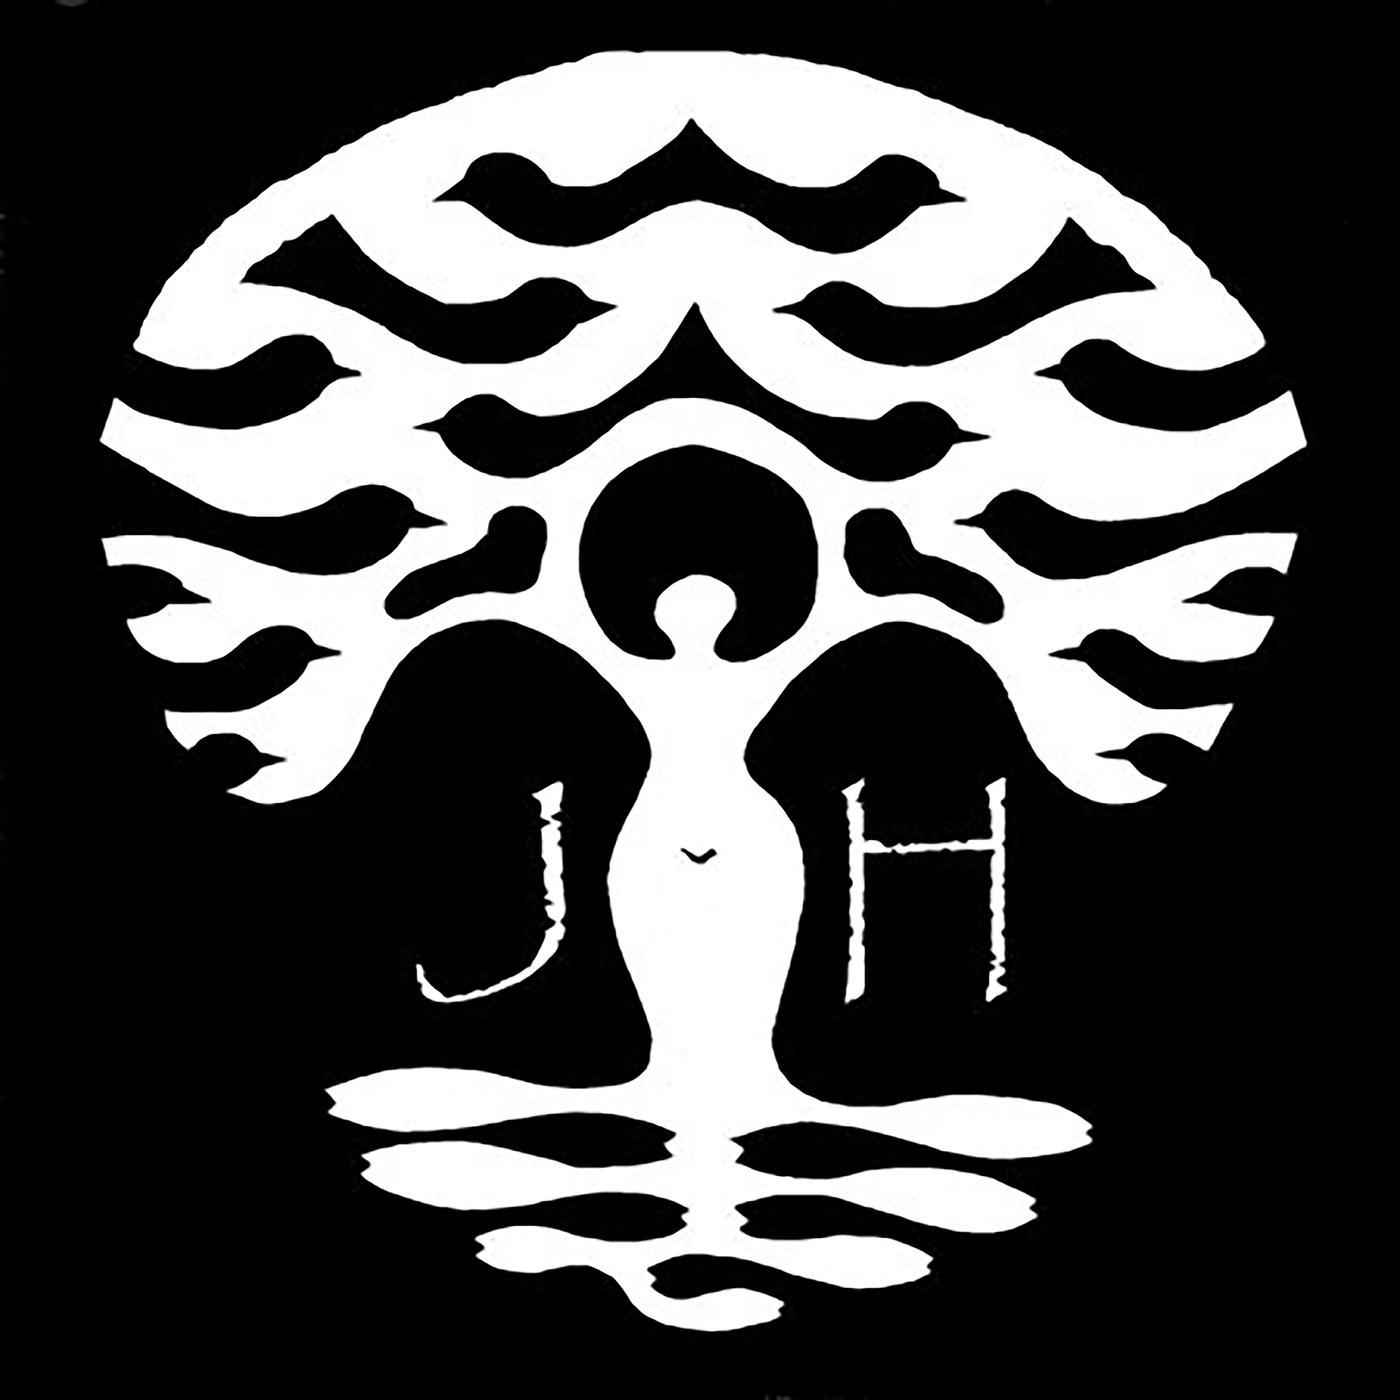 #3: Who Is Jaecinta?